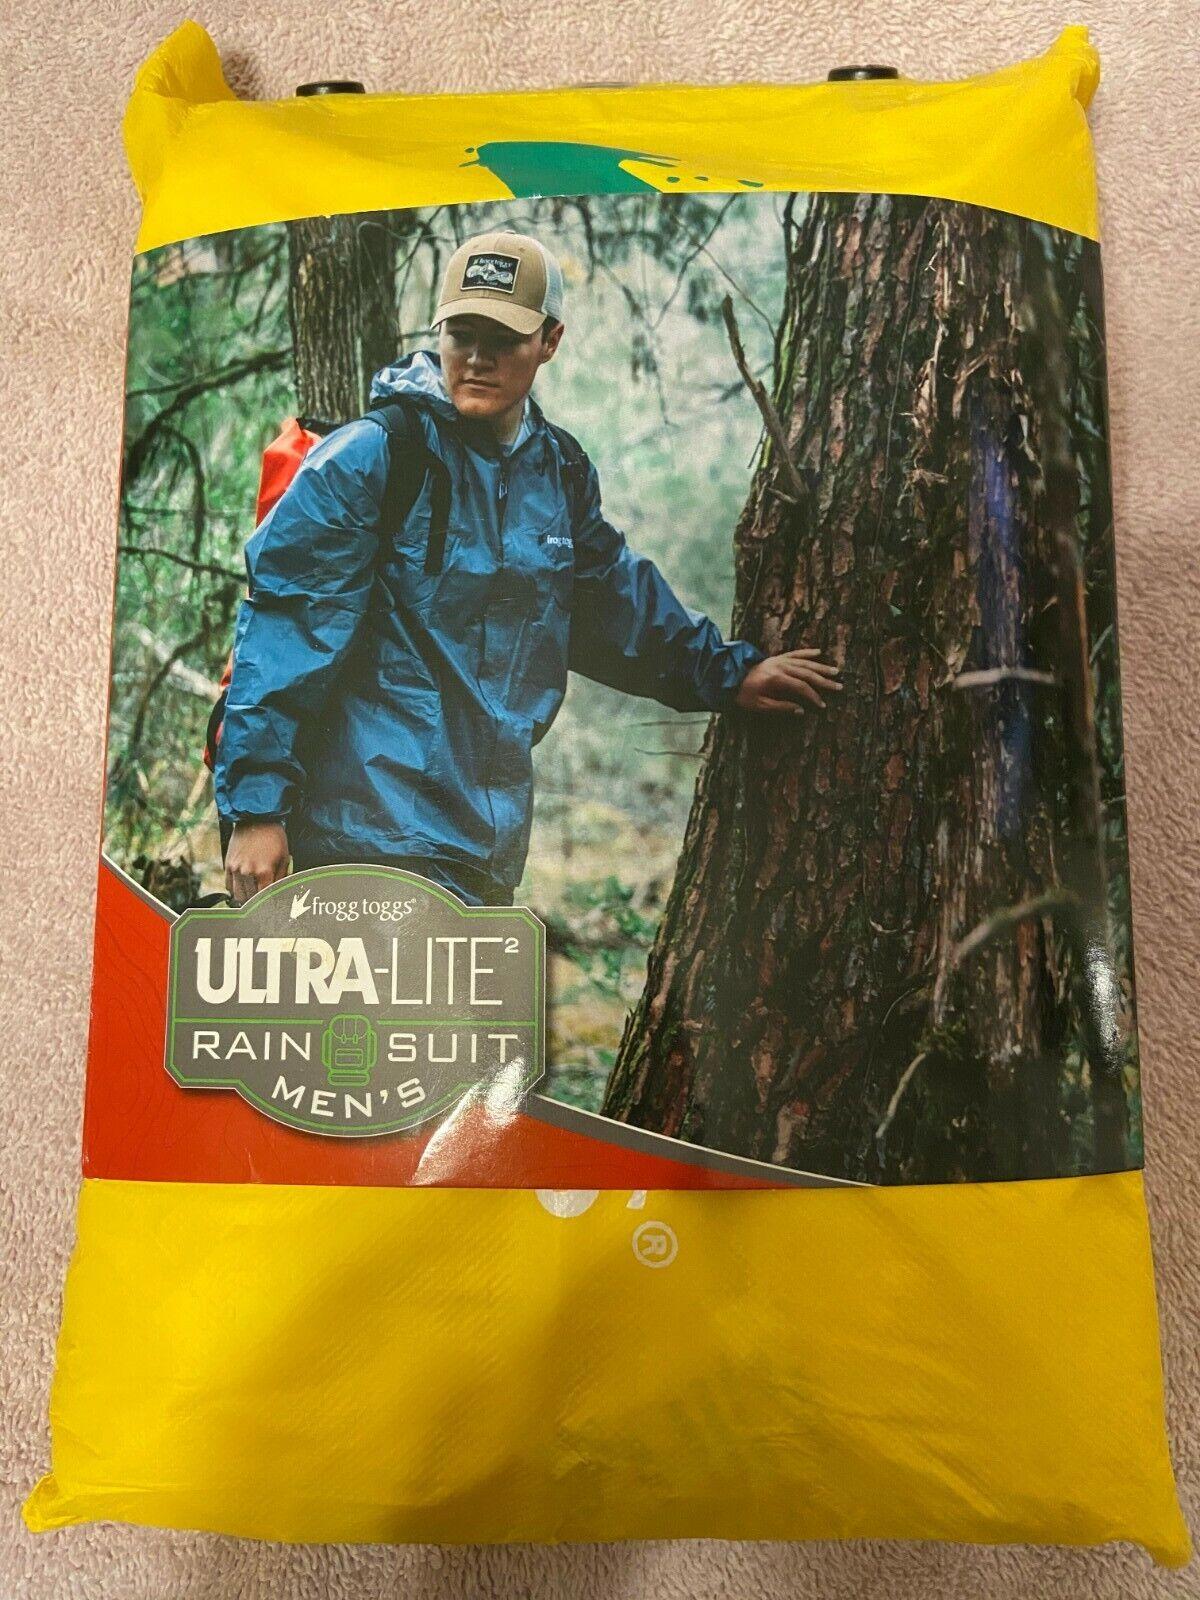 Frogg Toggs Men UltraLite2 Rain Suit w//Storage Bag Yellow UL12104-08 CHOOSE SIZE